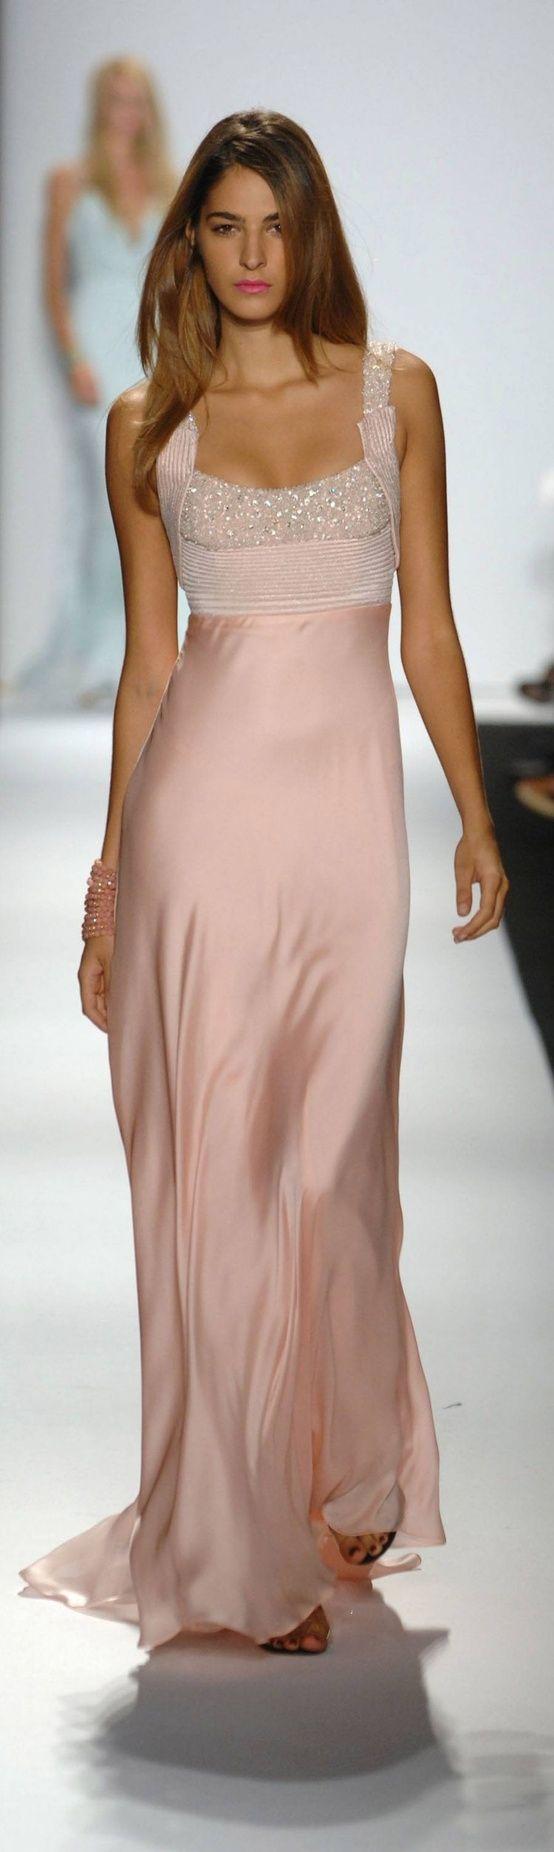 Pink gown | Vestidos de fiesta largos | Pinterest | Vestiditos ...